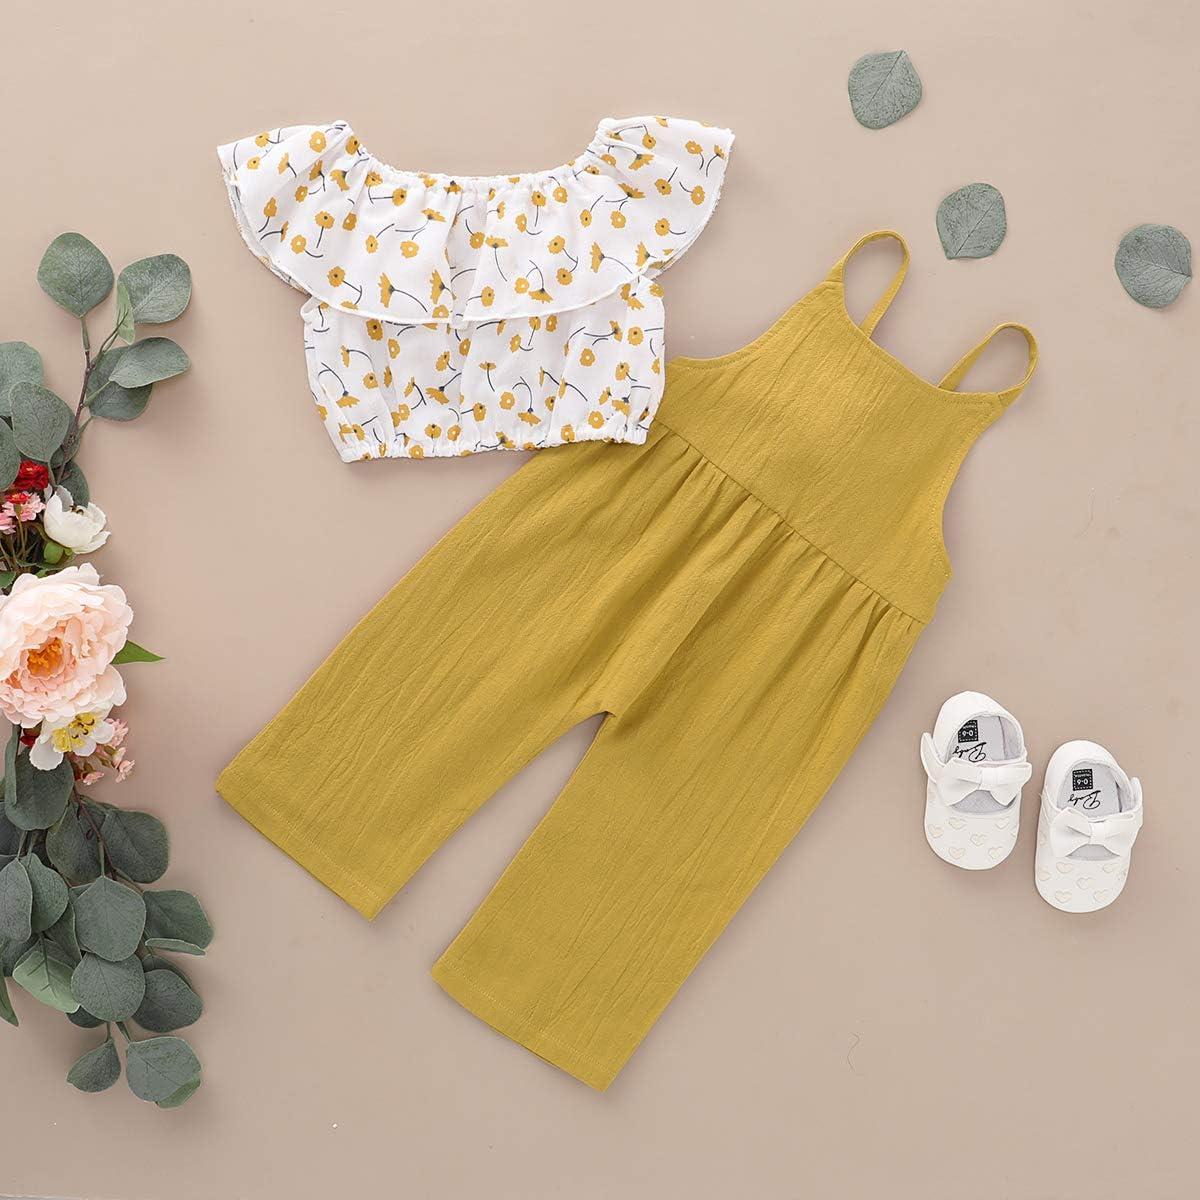 DaMohony Neugeborenes Baby M/ädchen Kleidung Outfit Floral /Ärmelloses Shirt Top Hosentr/äger Hosen Overalls Outfits Set